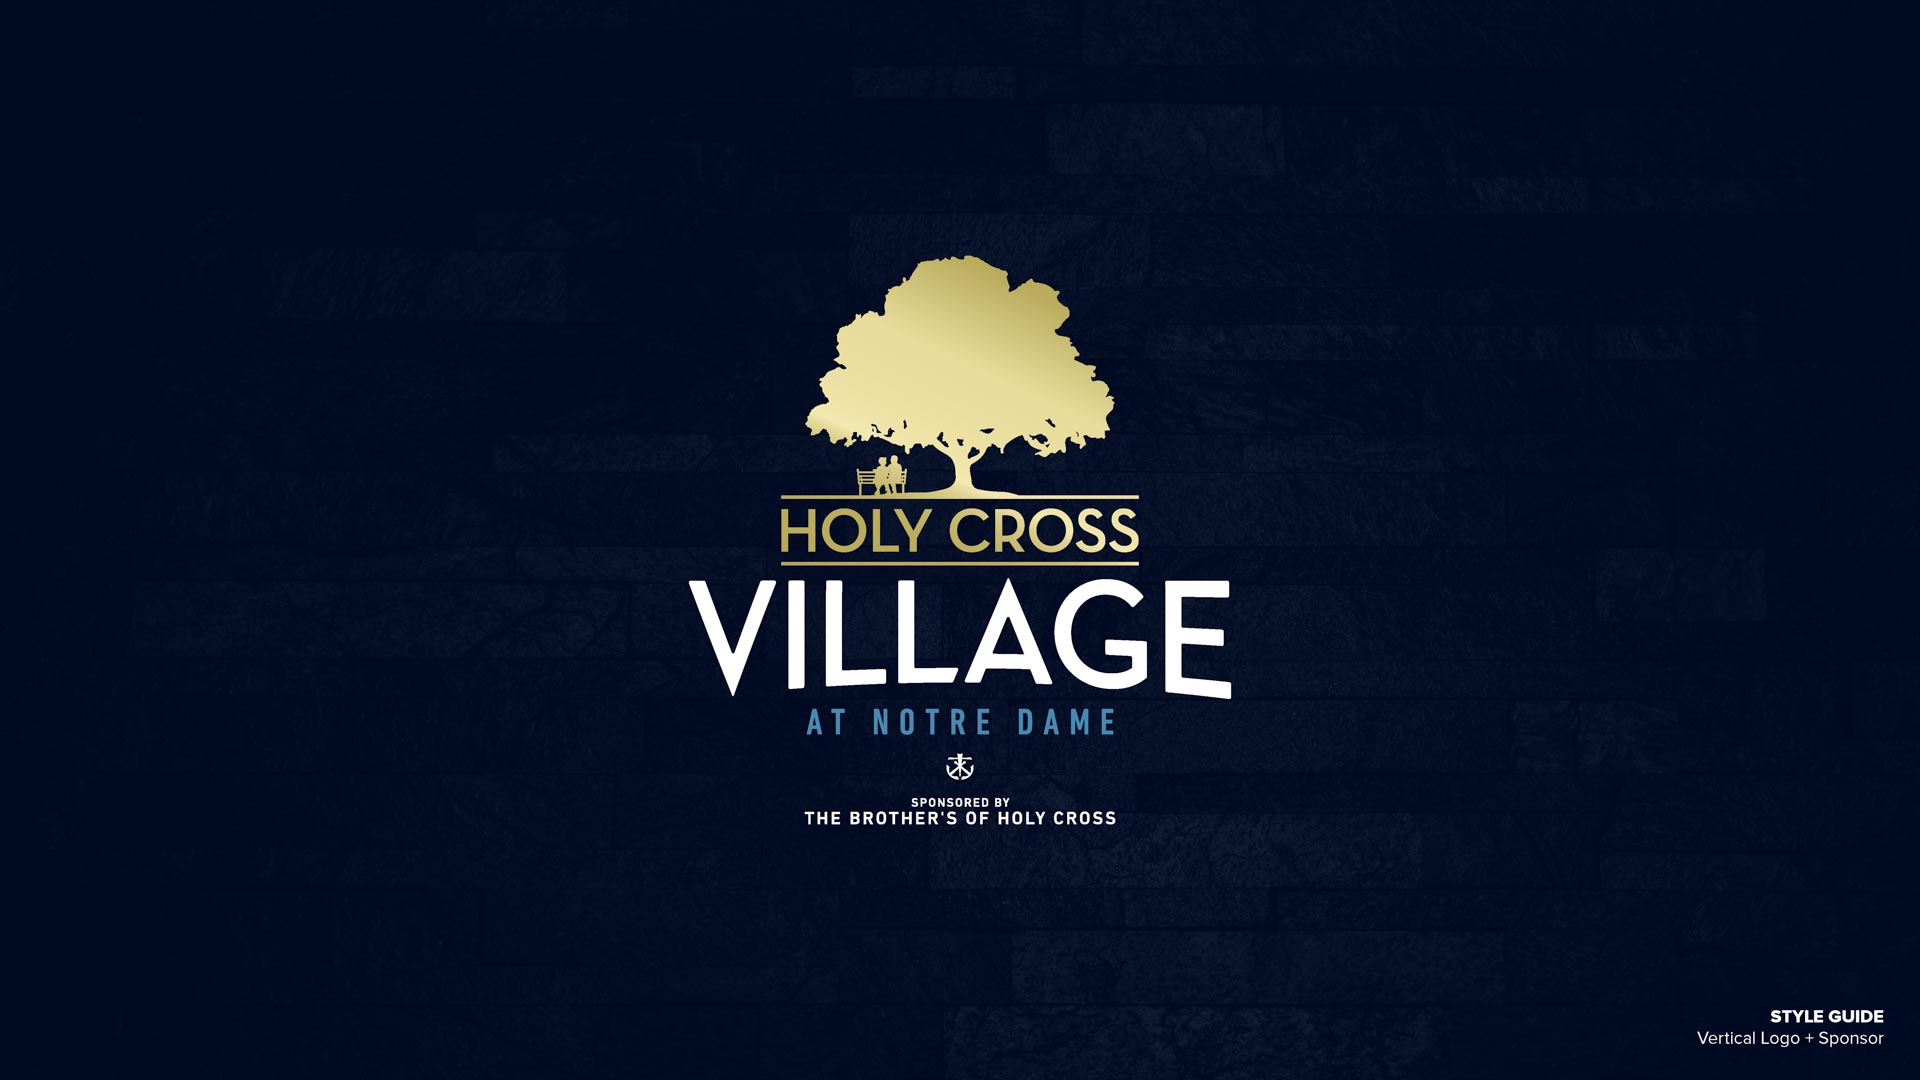 Holy Cross Village's Vertical Logo + Sponsor (Unofficial)